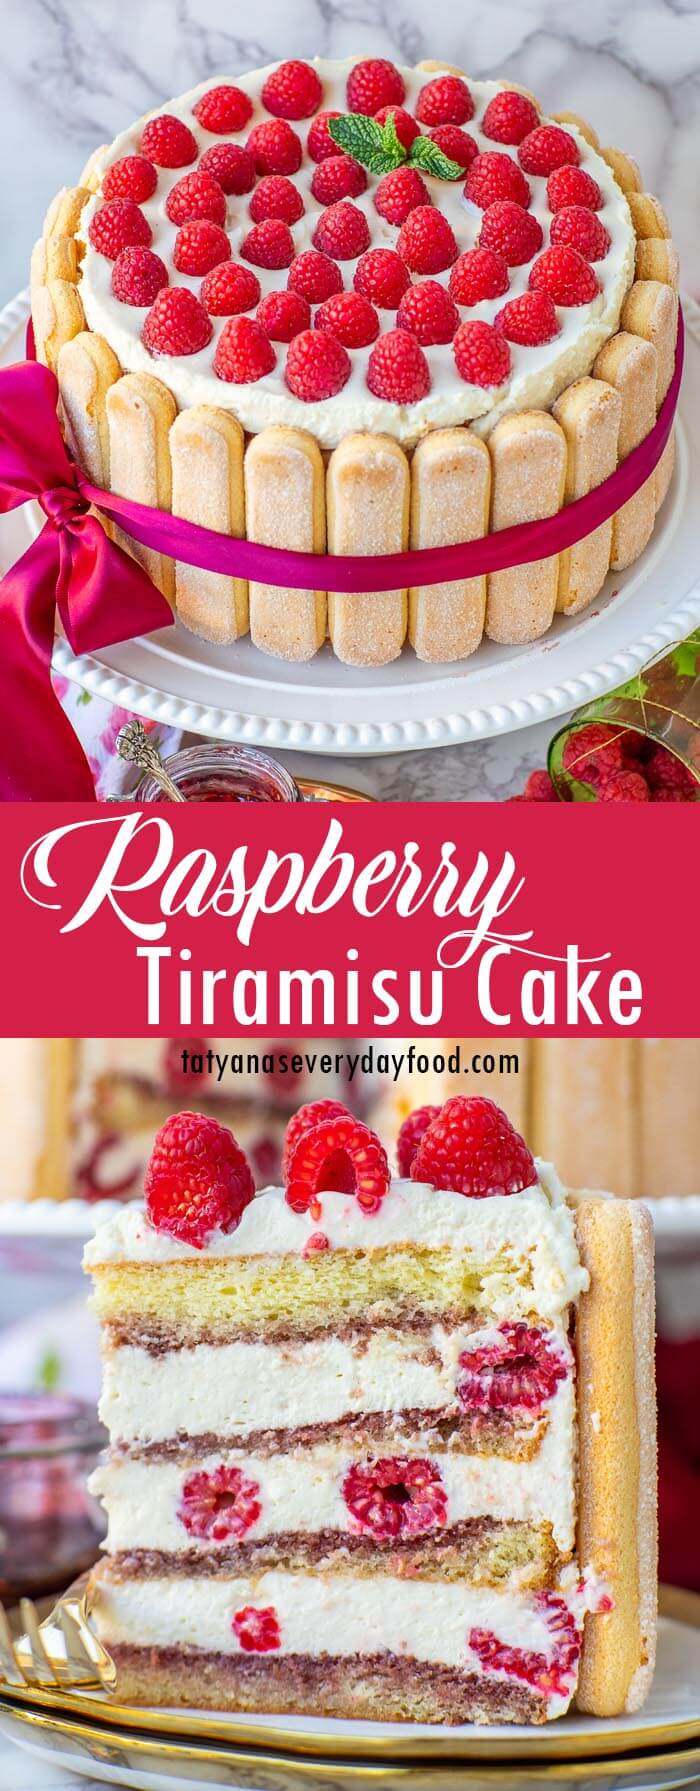 Raspberry Tiramisu Cake video recipe